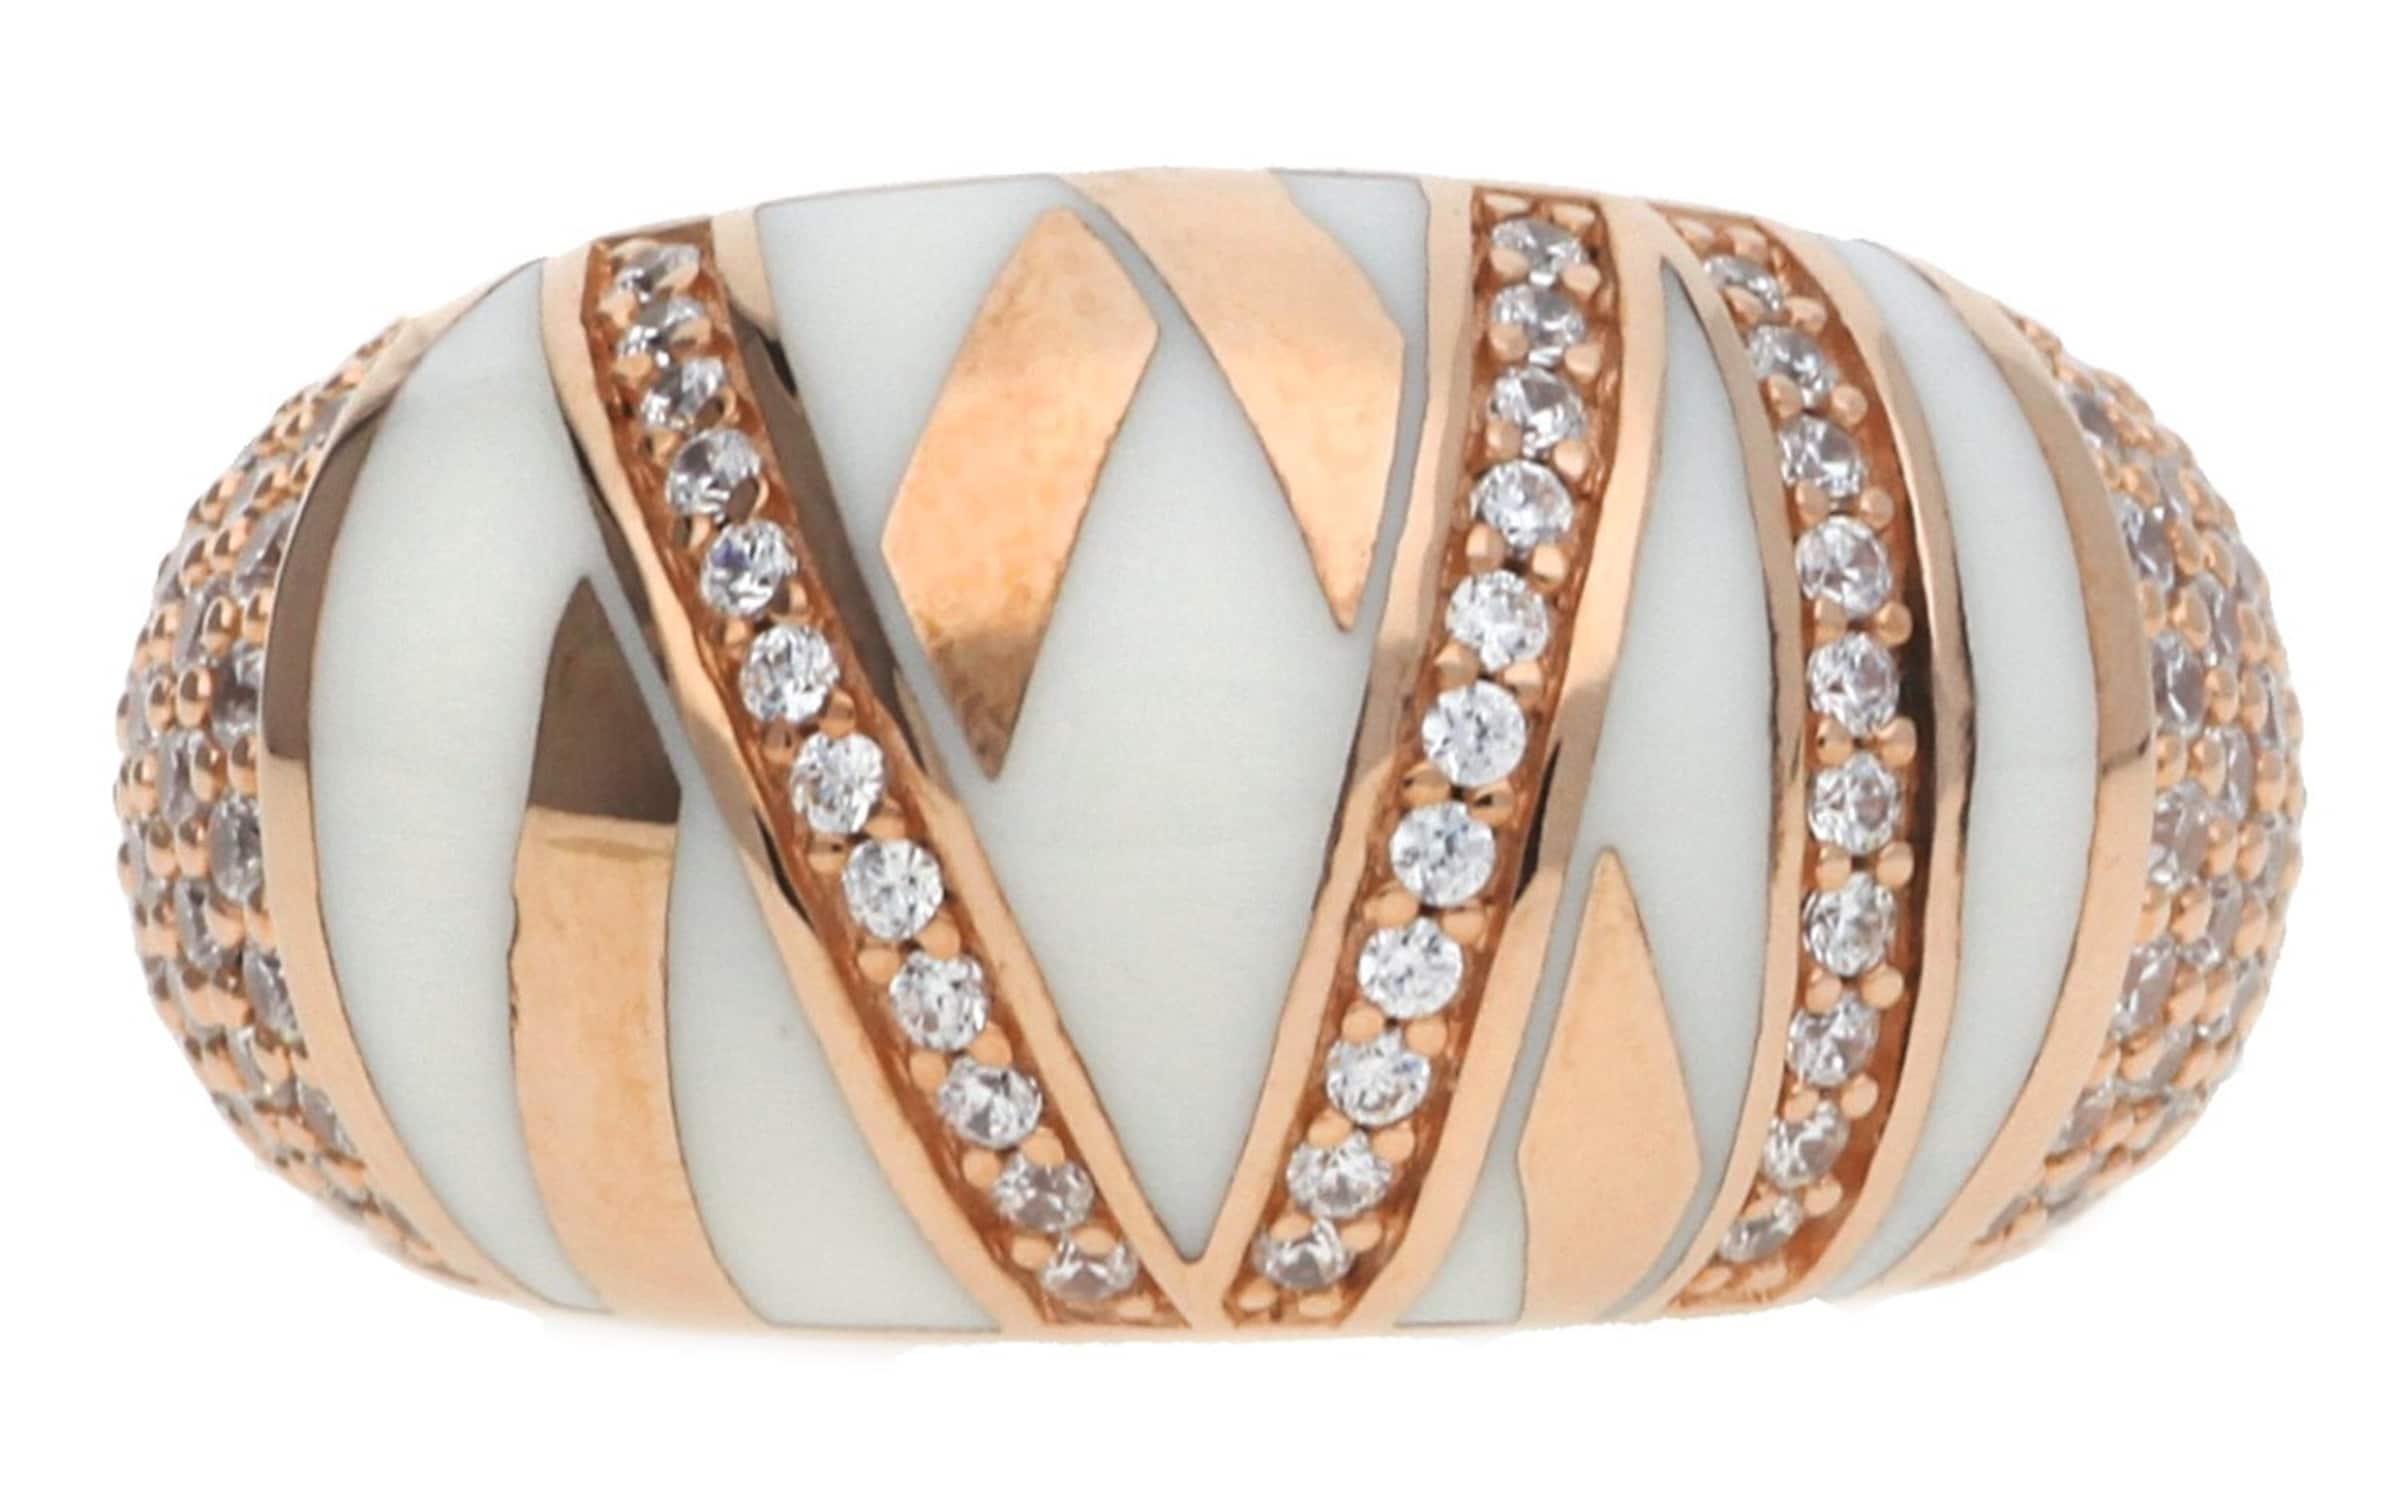 JOOP! Fingerring Silber Rosegold Stripes Verkauf Aus Deutschland ybNmXk